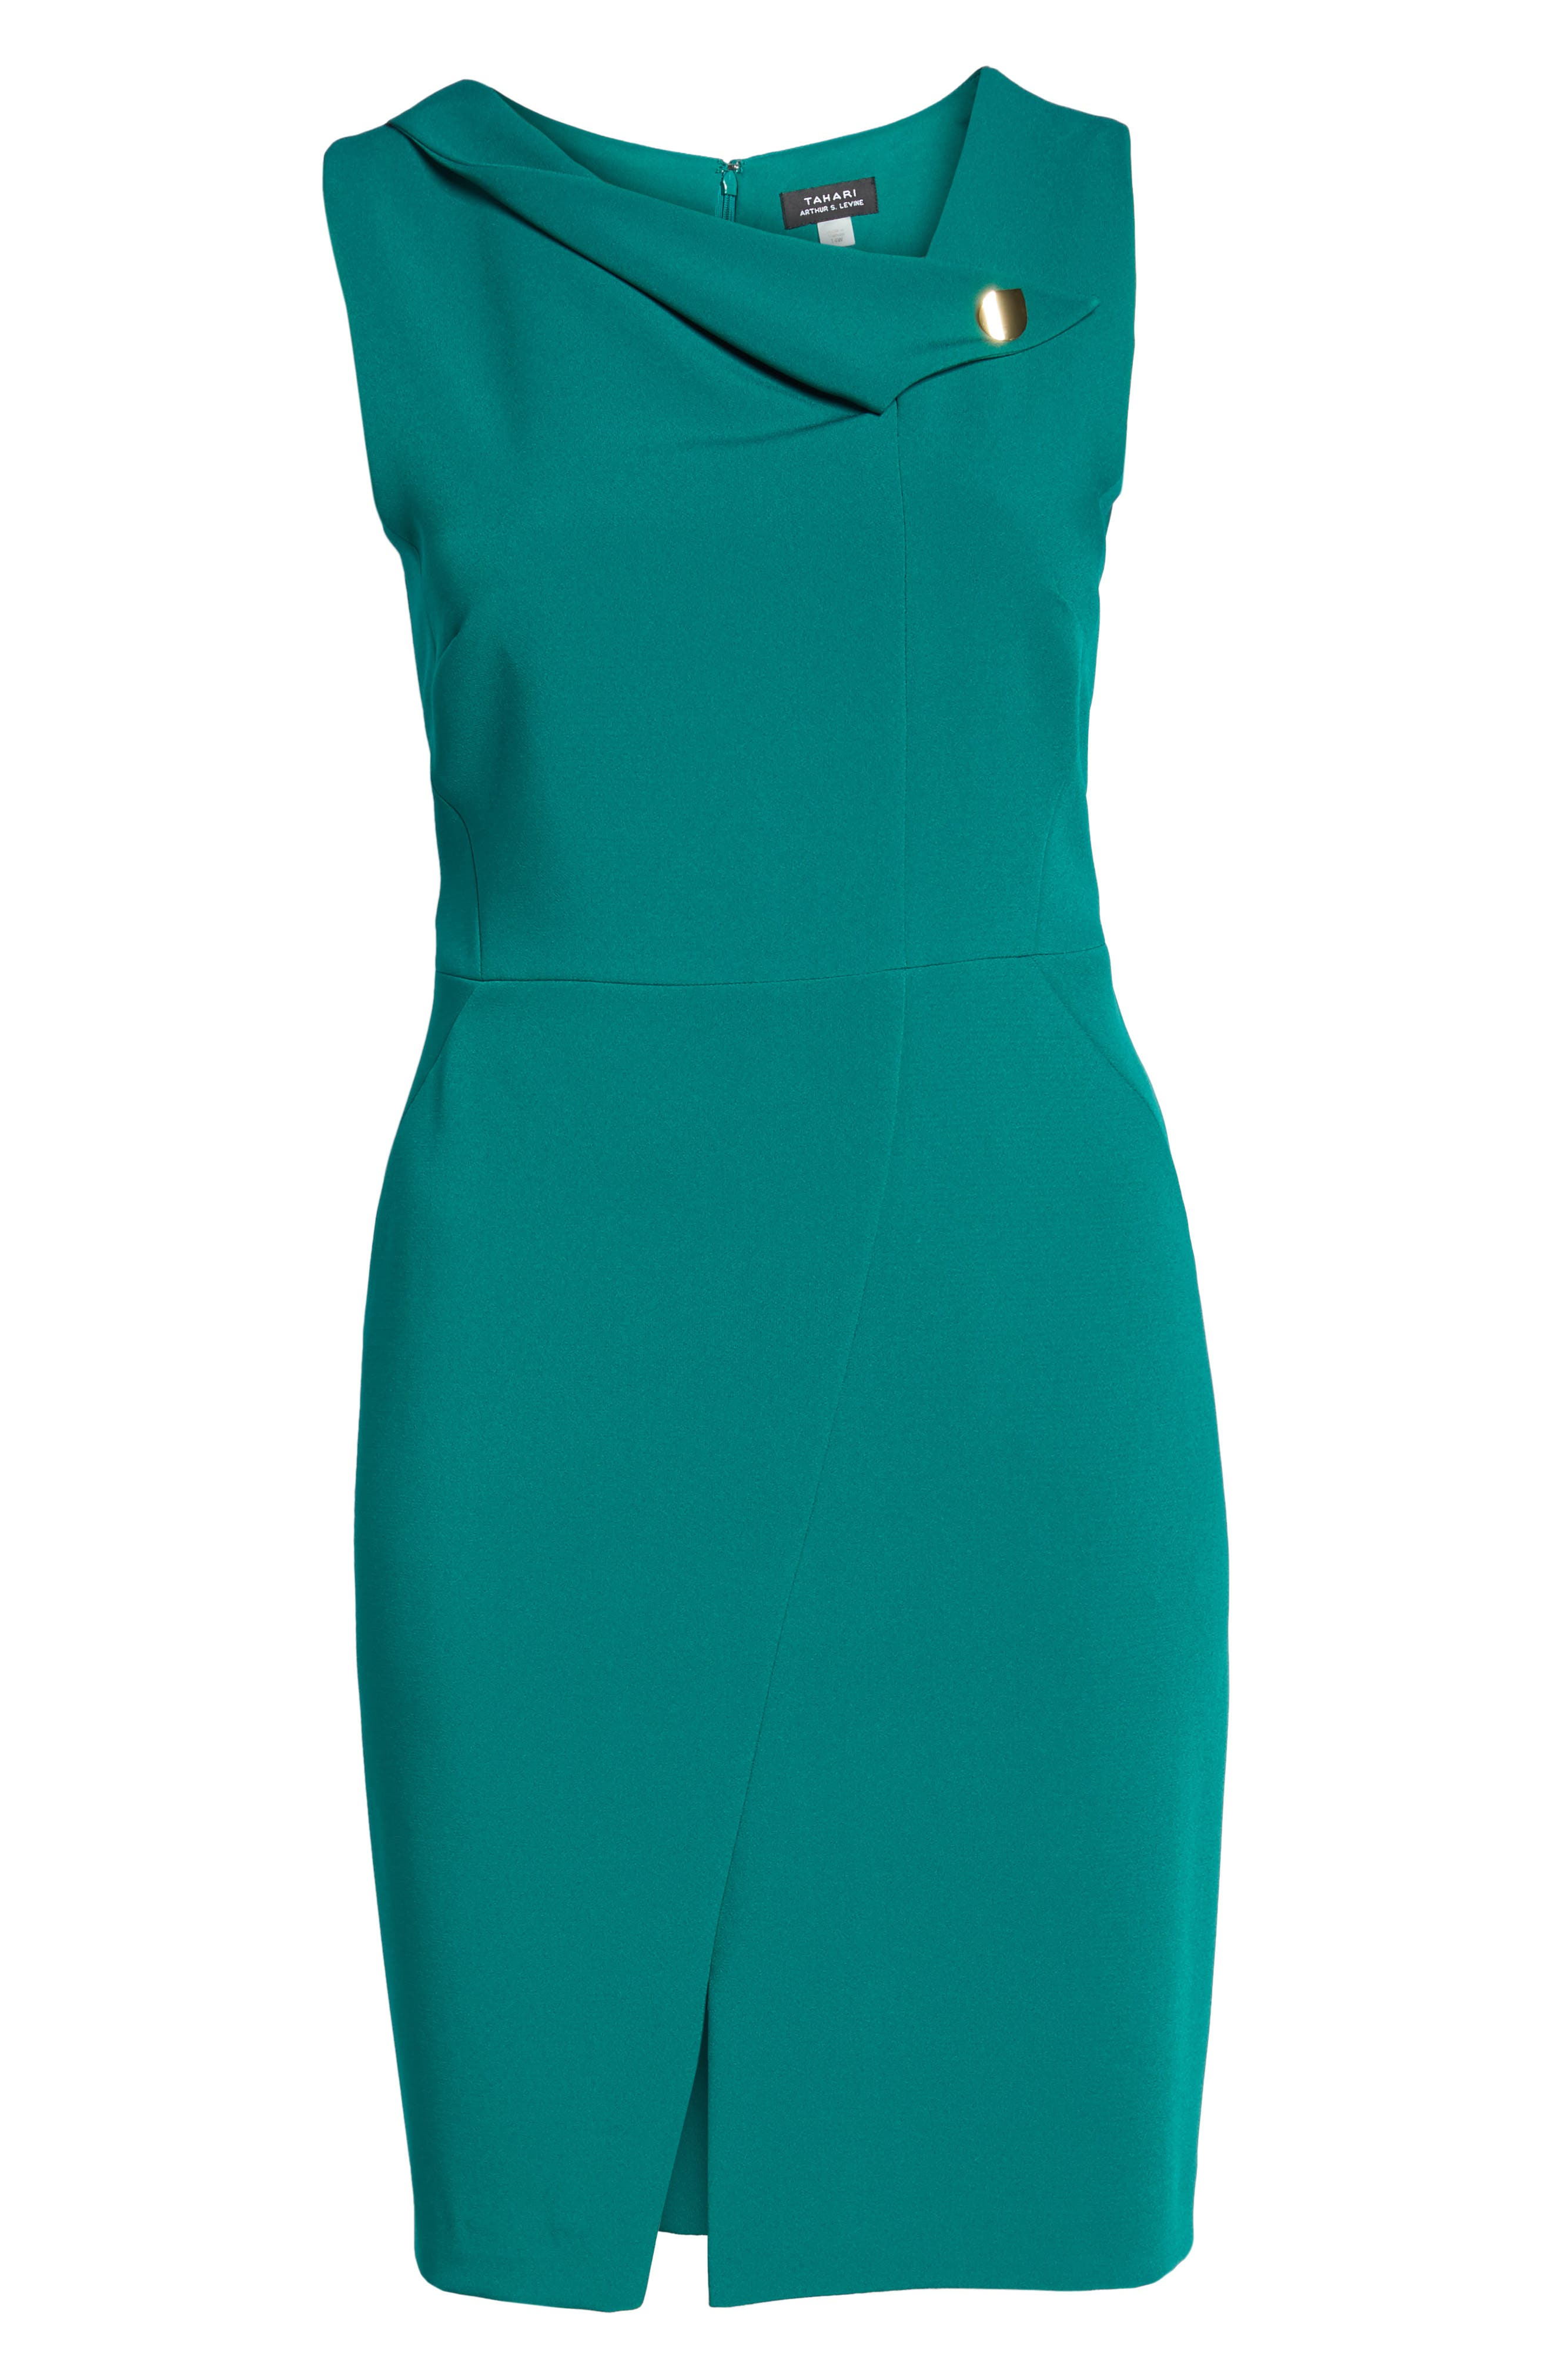 Envelope Neck with Button Sheath Dress,                             Alternate thumbnail 6, color,                             307